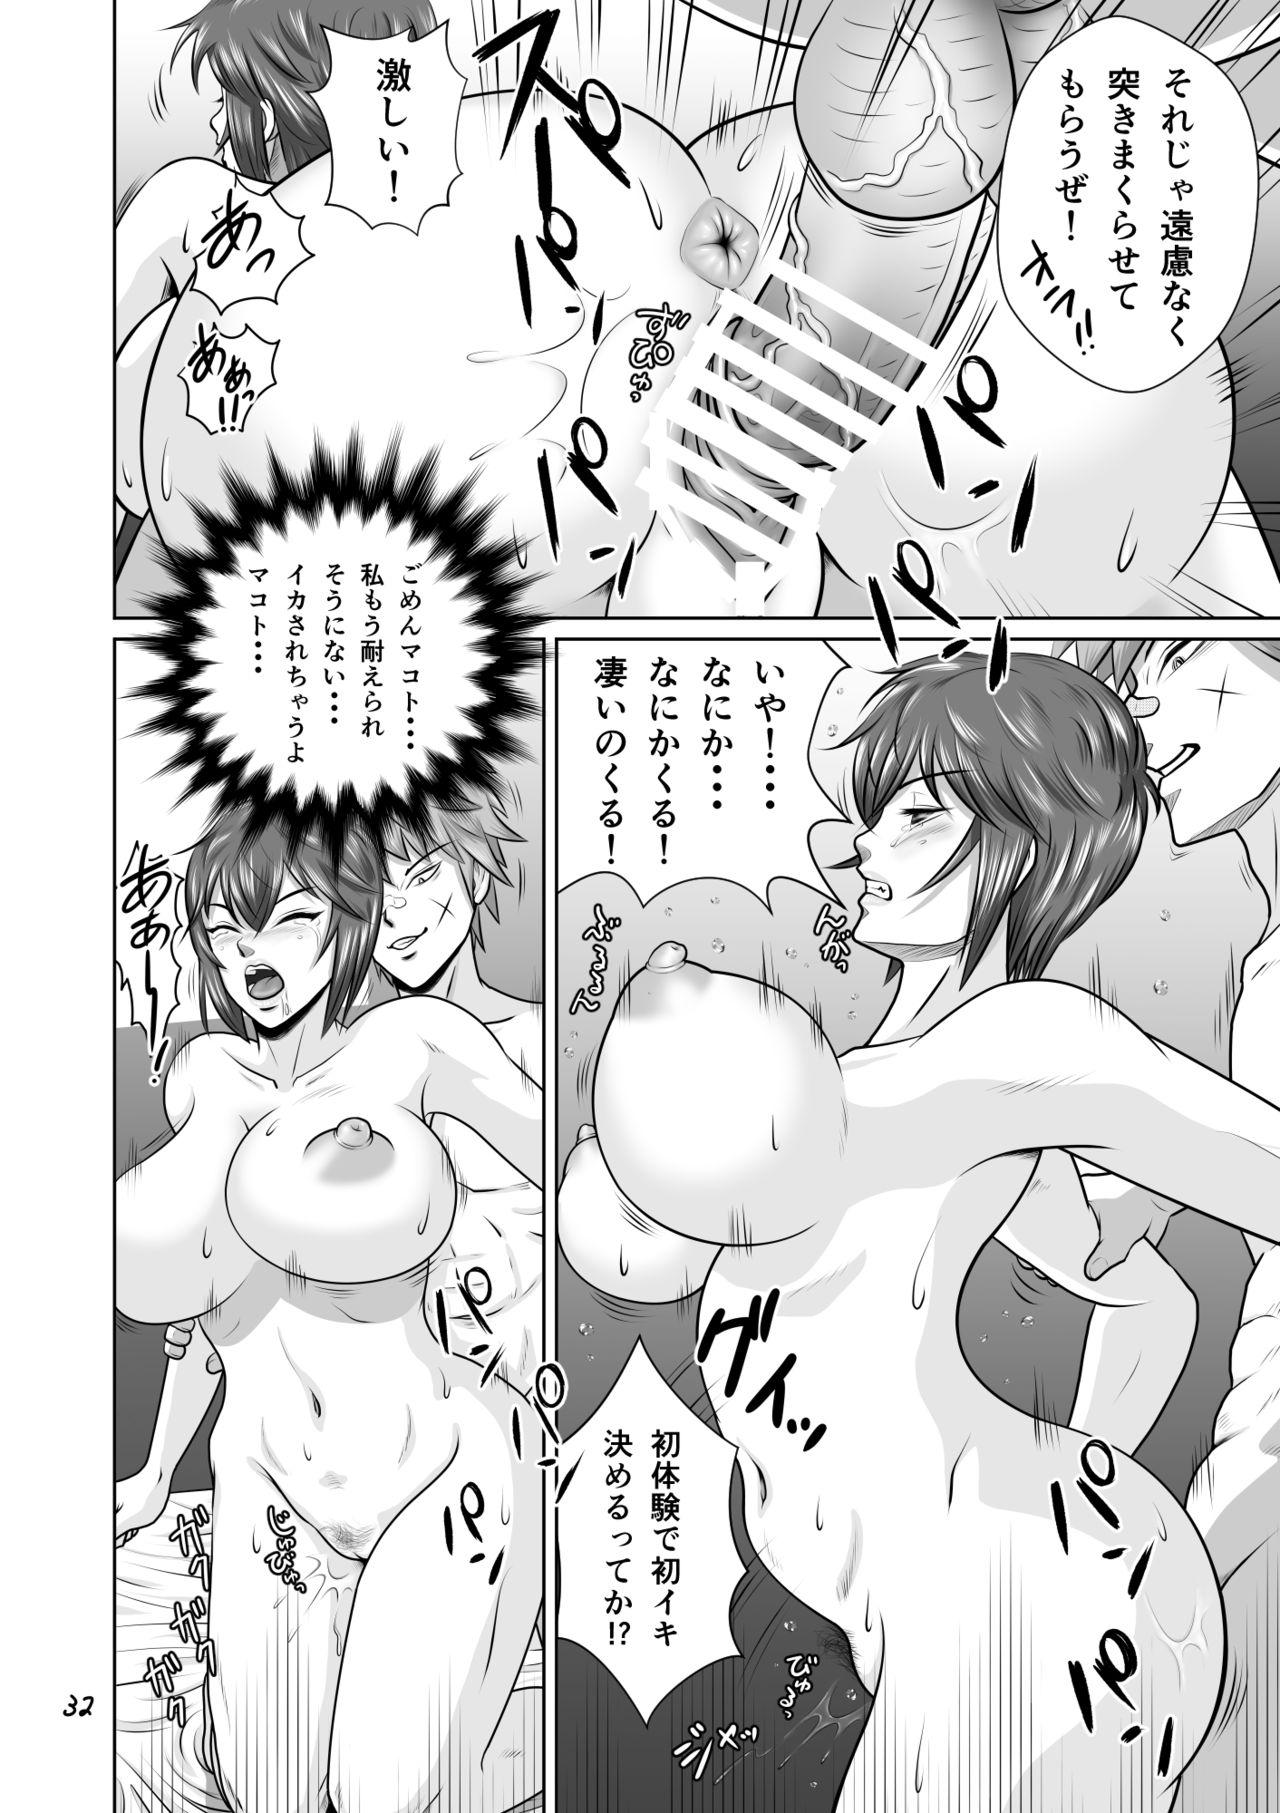 Netorare Osananajimi Haruka-chan Kiki Ippatsu!! 32